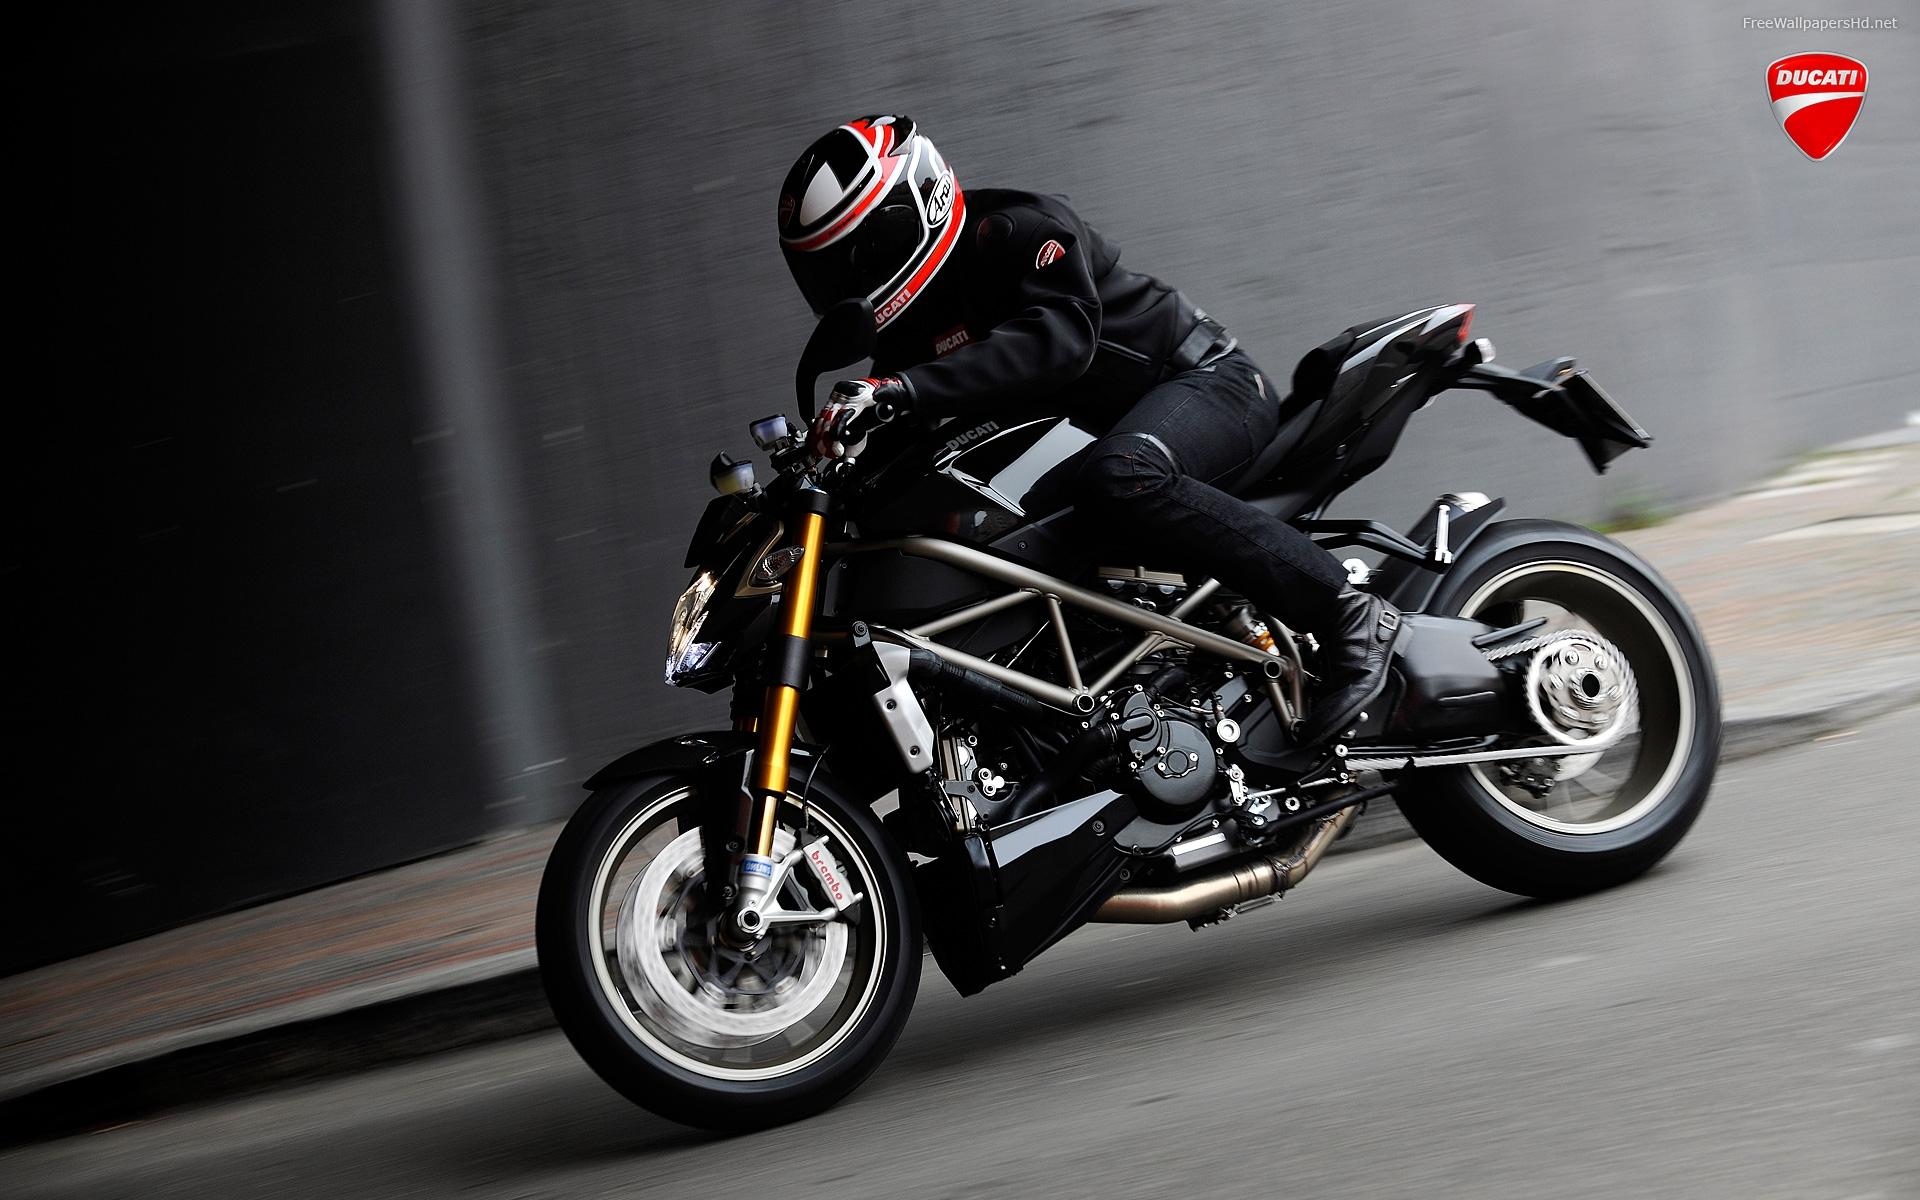 motorcycle ducati motorcycles free 1221818 wallpaper wallpaper